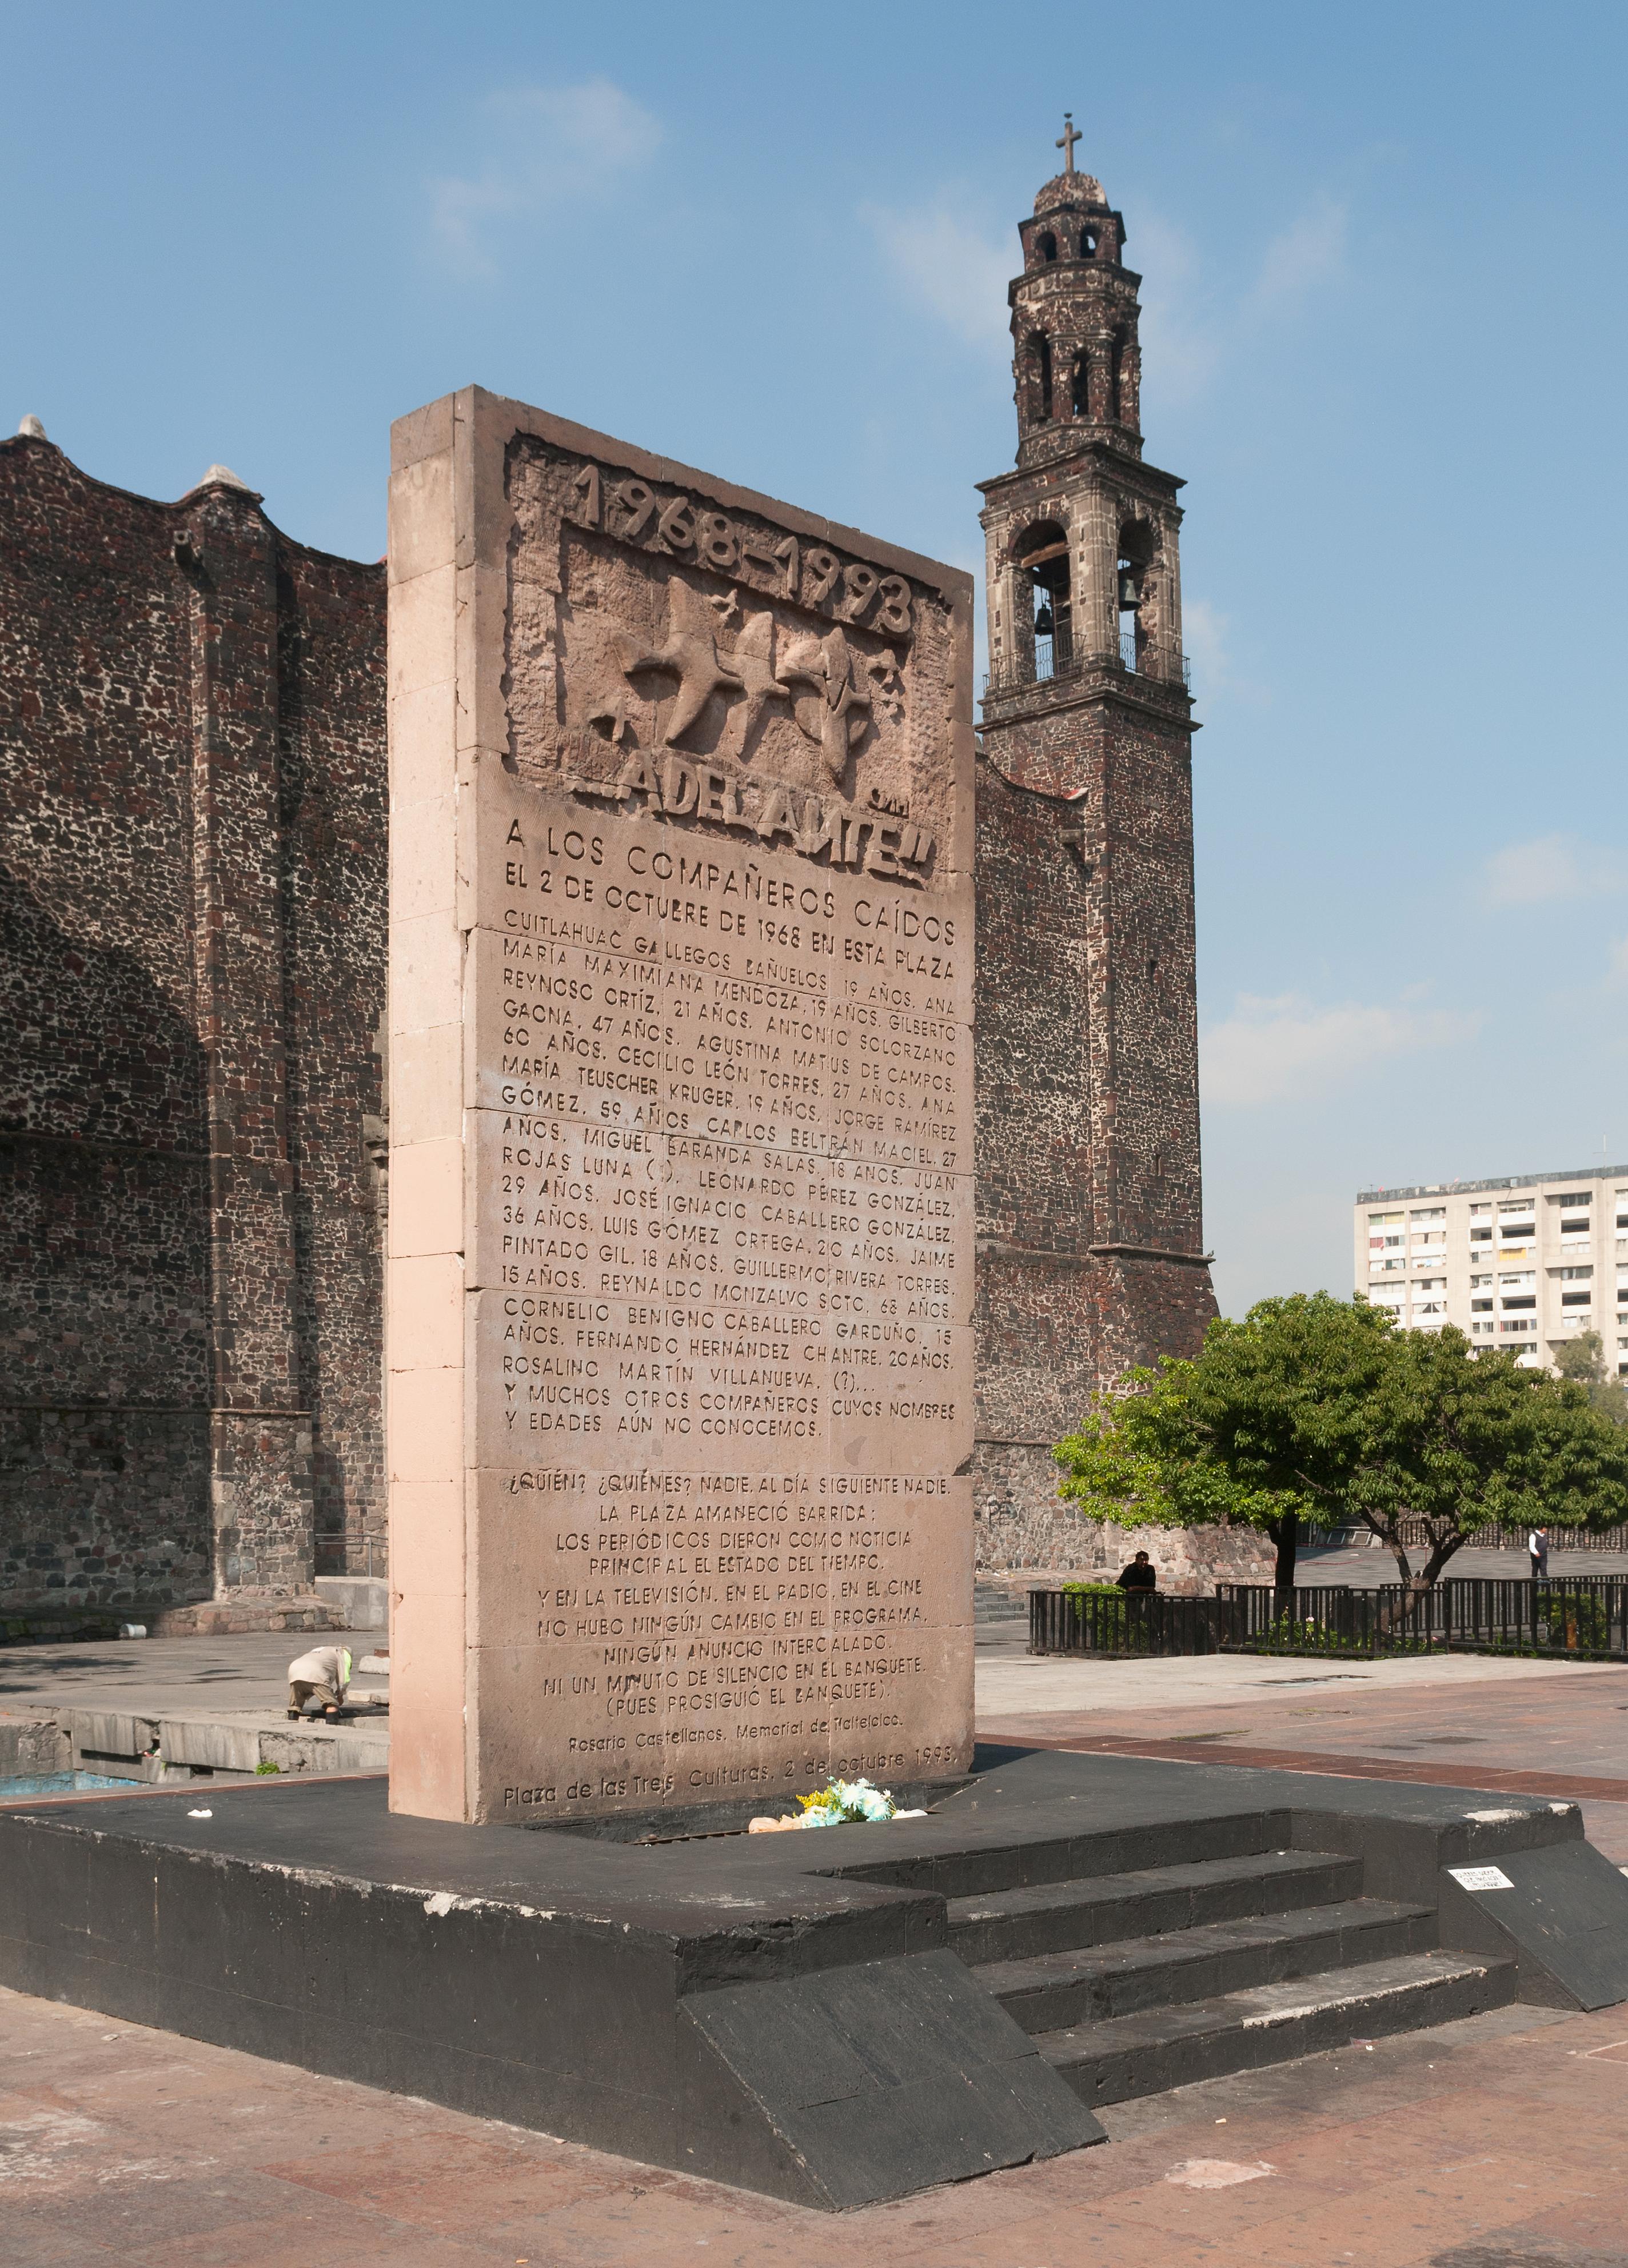 Masacre De Tlatelolco Wikipedia La Enciclopedia Libre